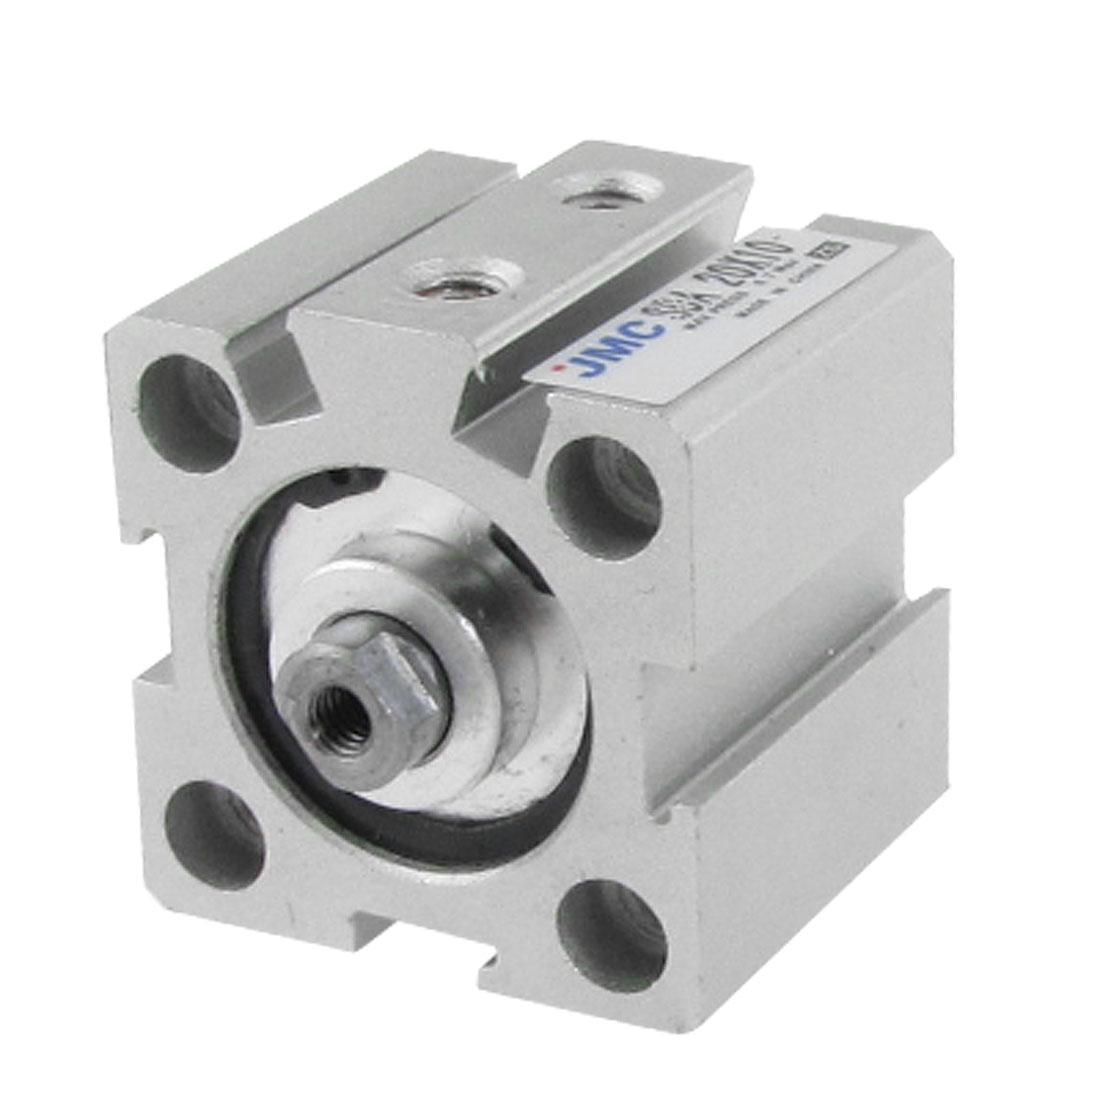 20mm Bore 10mm Stroke Aluminum Alloy Mini Thin Air Cylinder